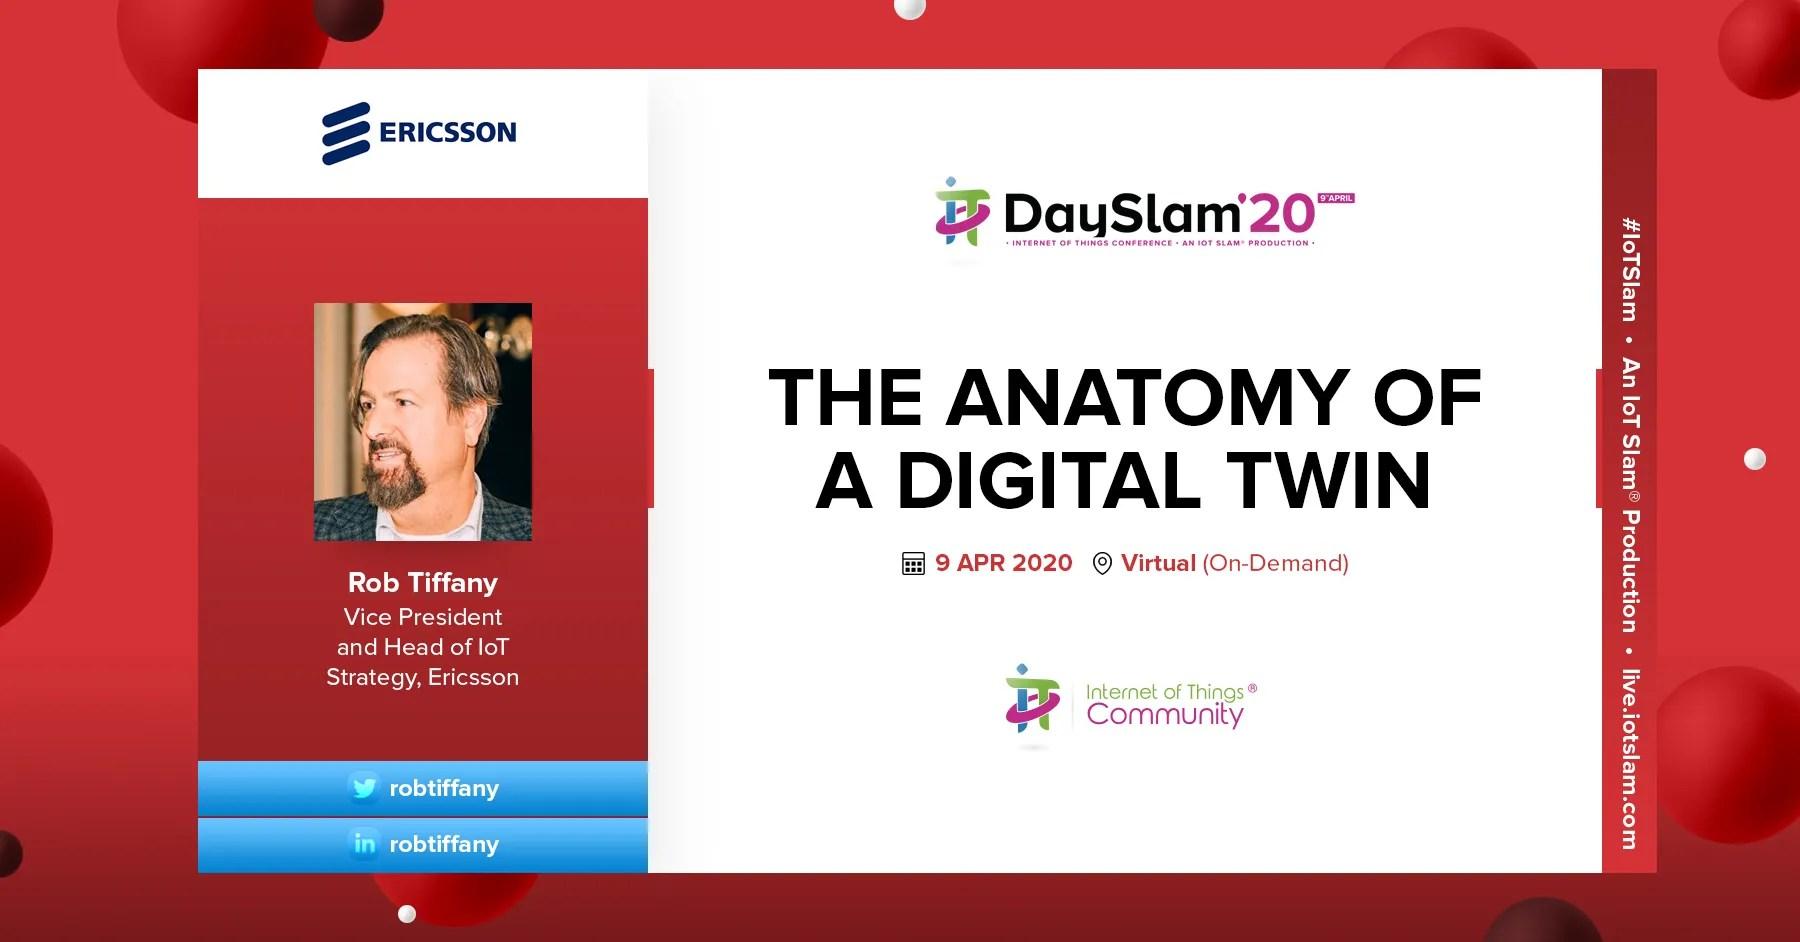 The Anatomy Of A Digital Twin